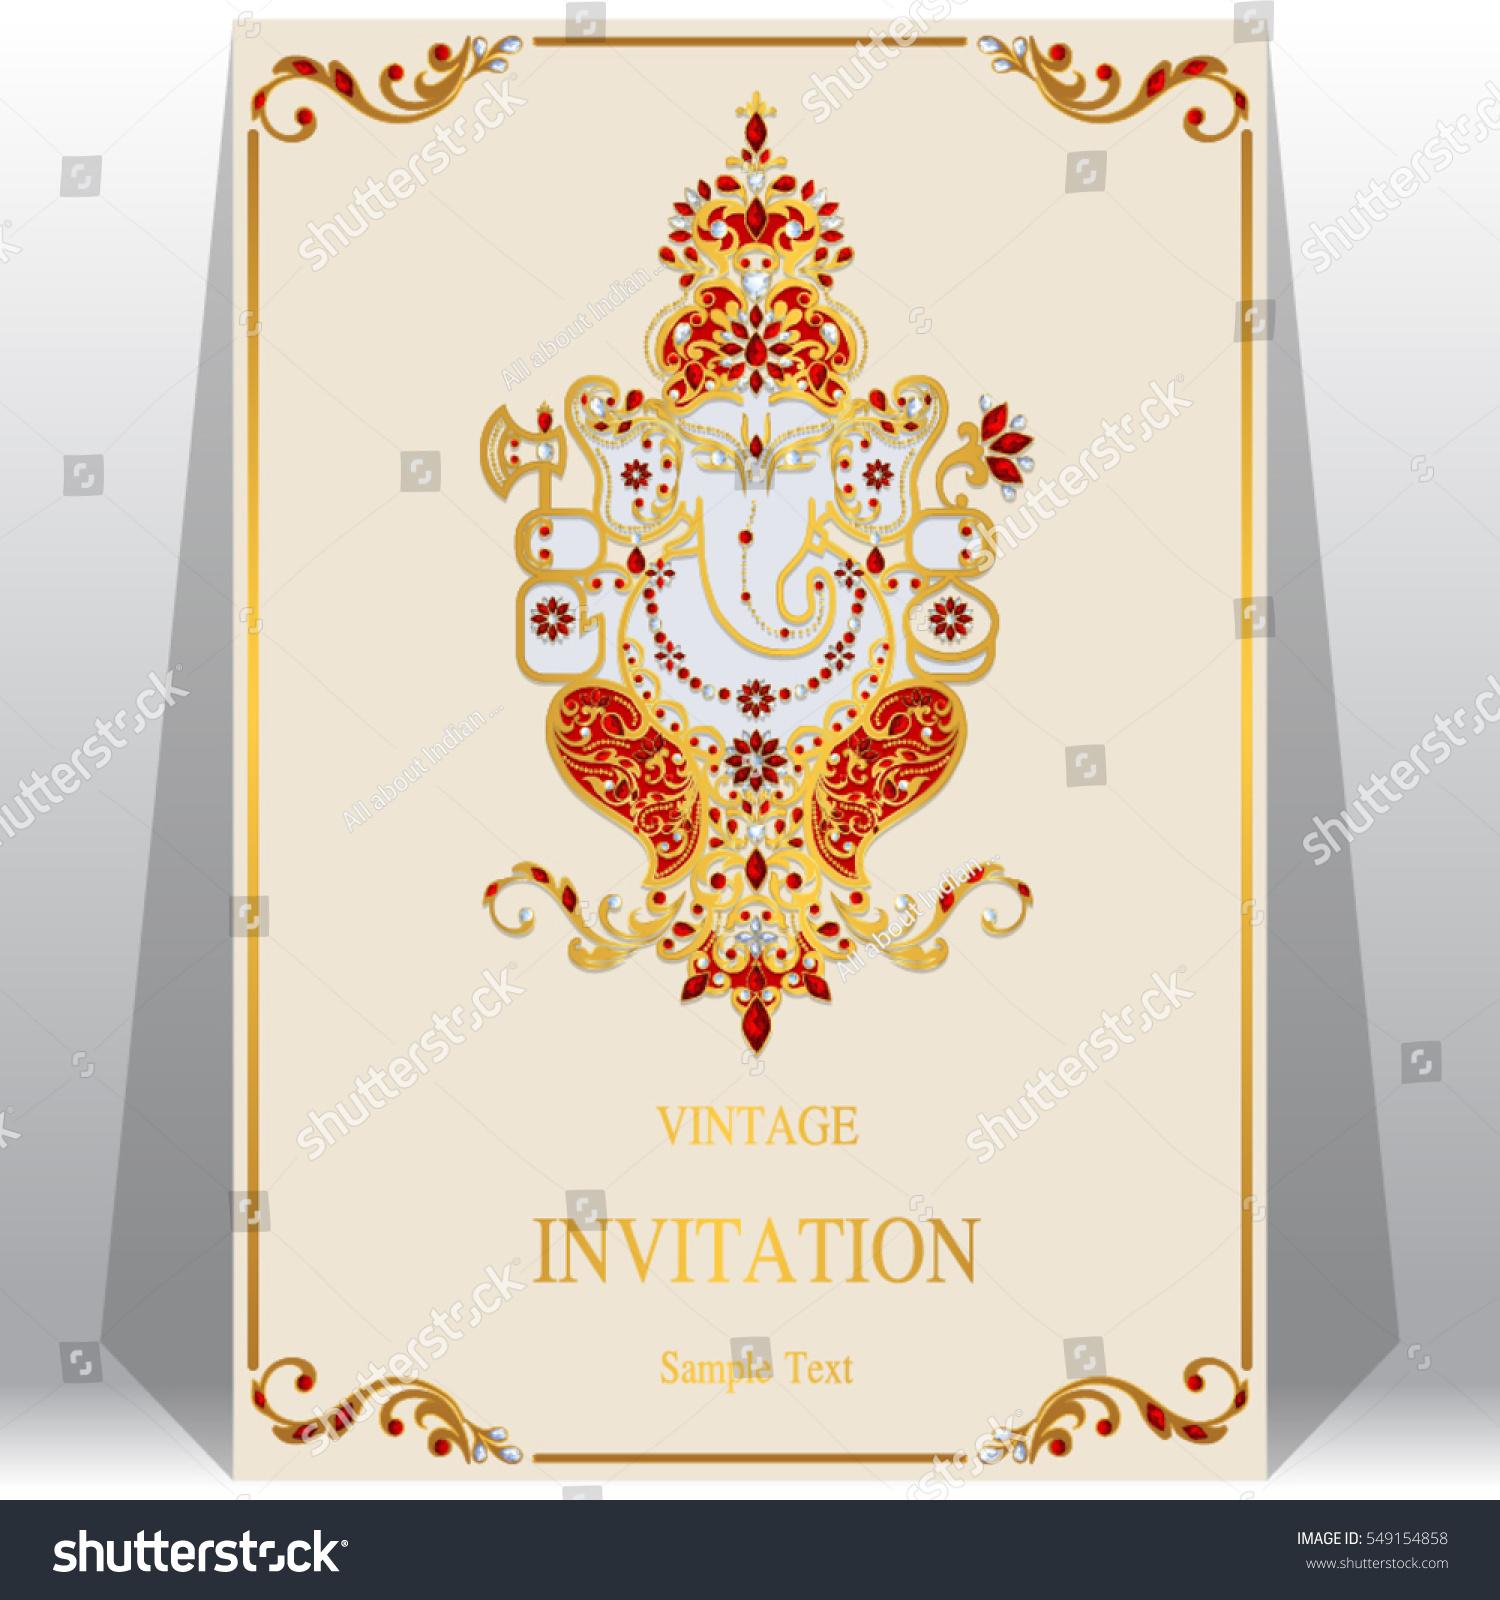 indian wedding invitation card templates gold stock vector 549154858 shutterstock. Black Bedroom Furniture Sets. Home Design Ideas